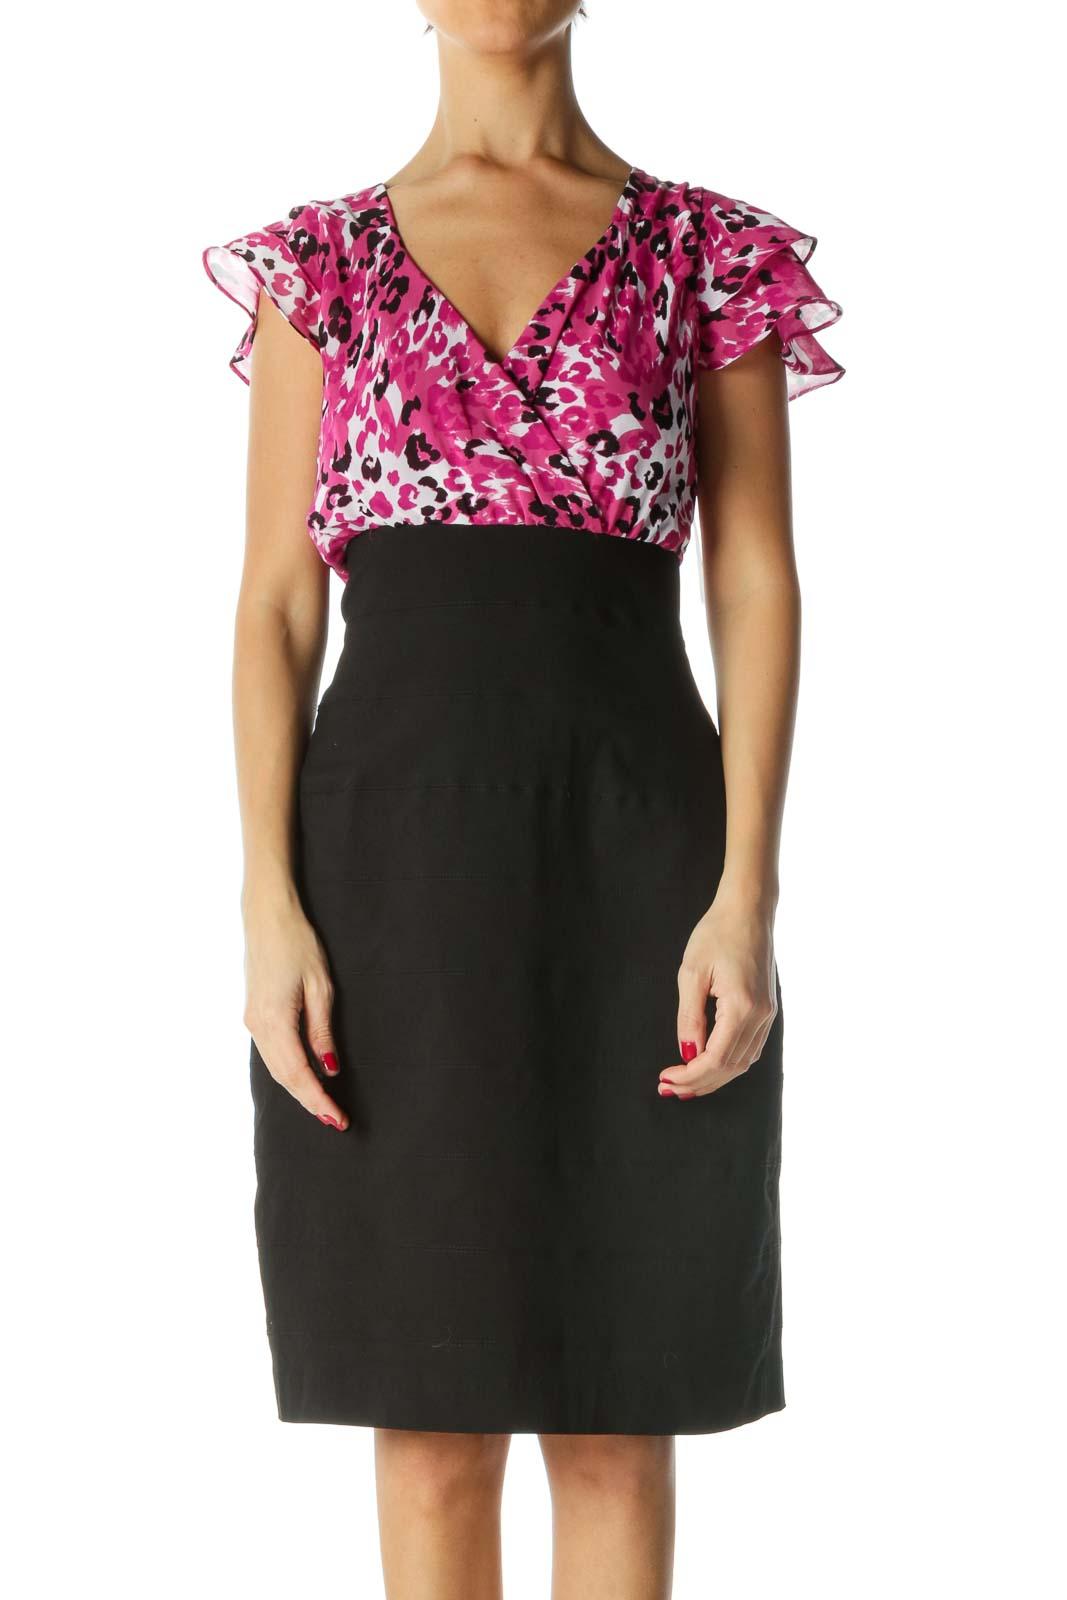 Black Pink White V-Neck Cocktail Dress Front